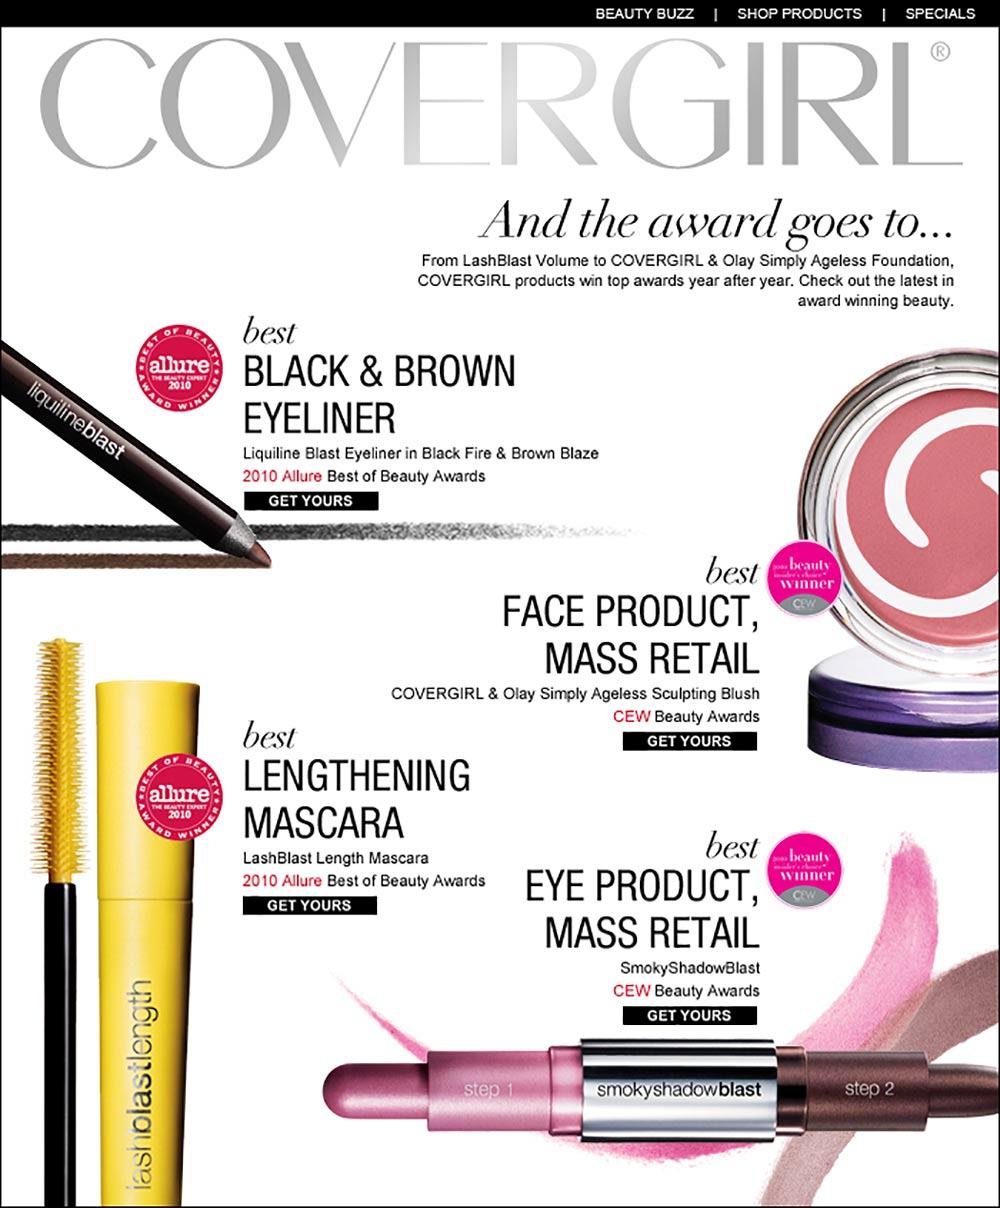 Covergirl: email design